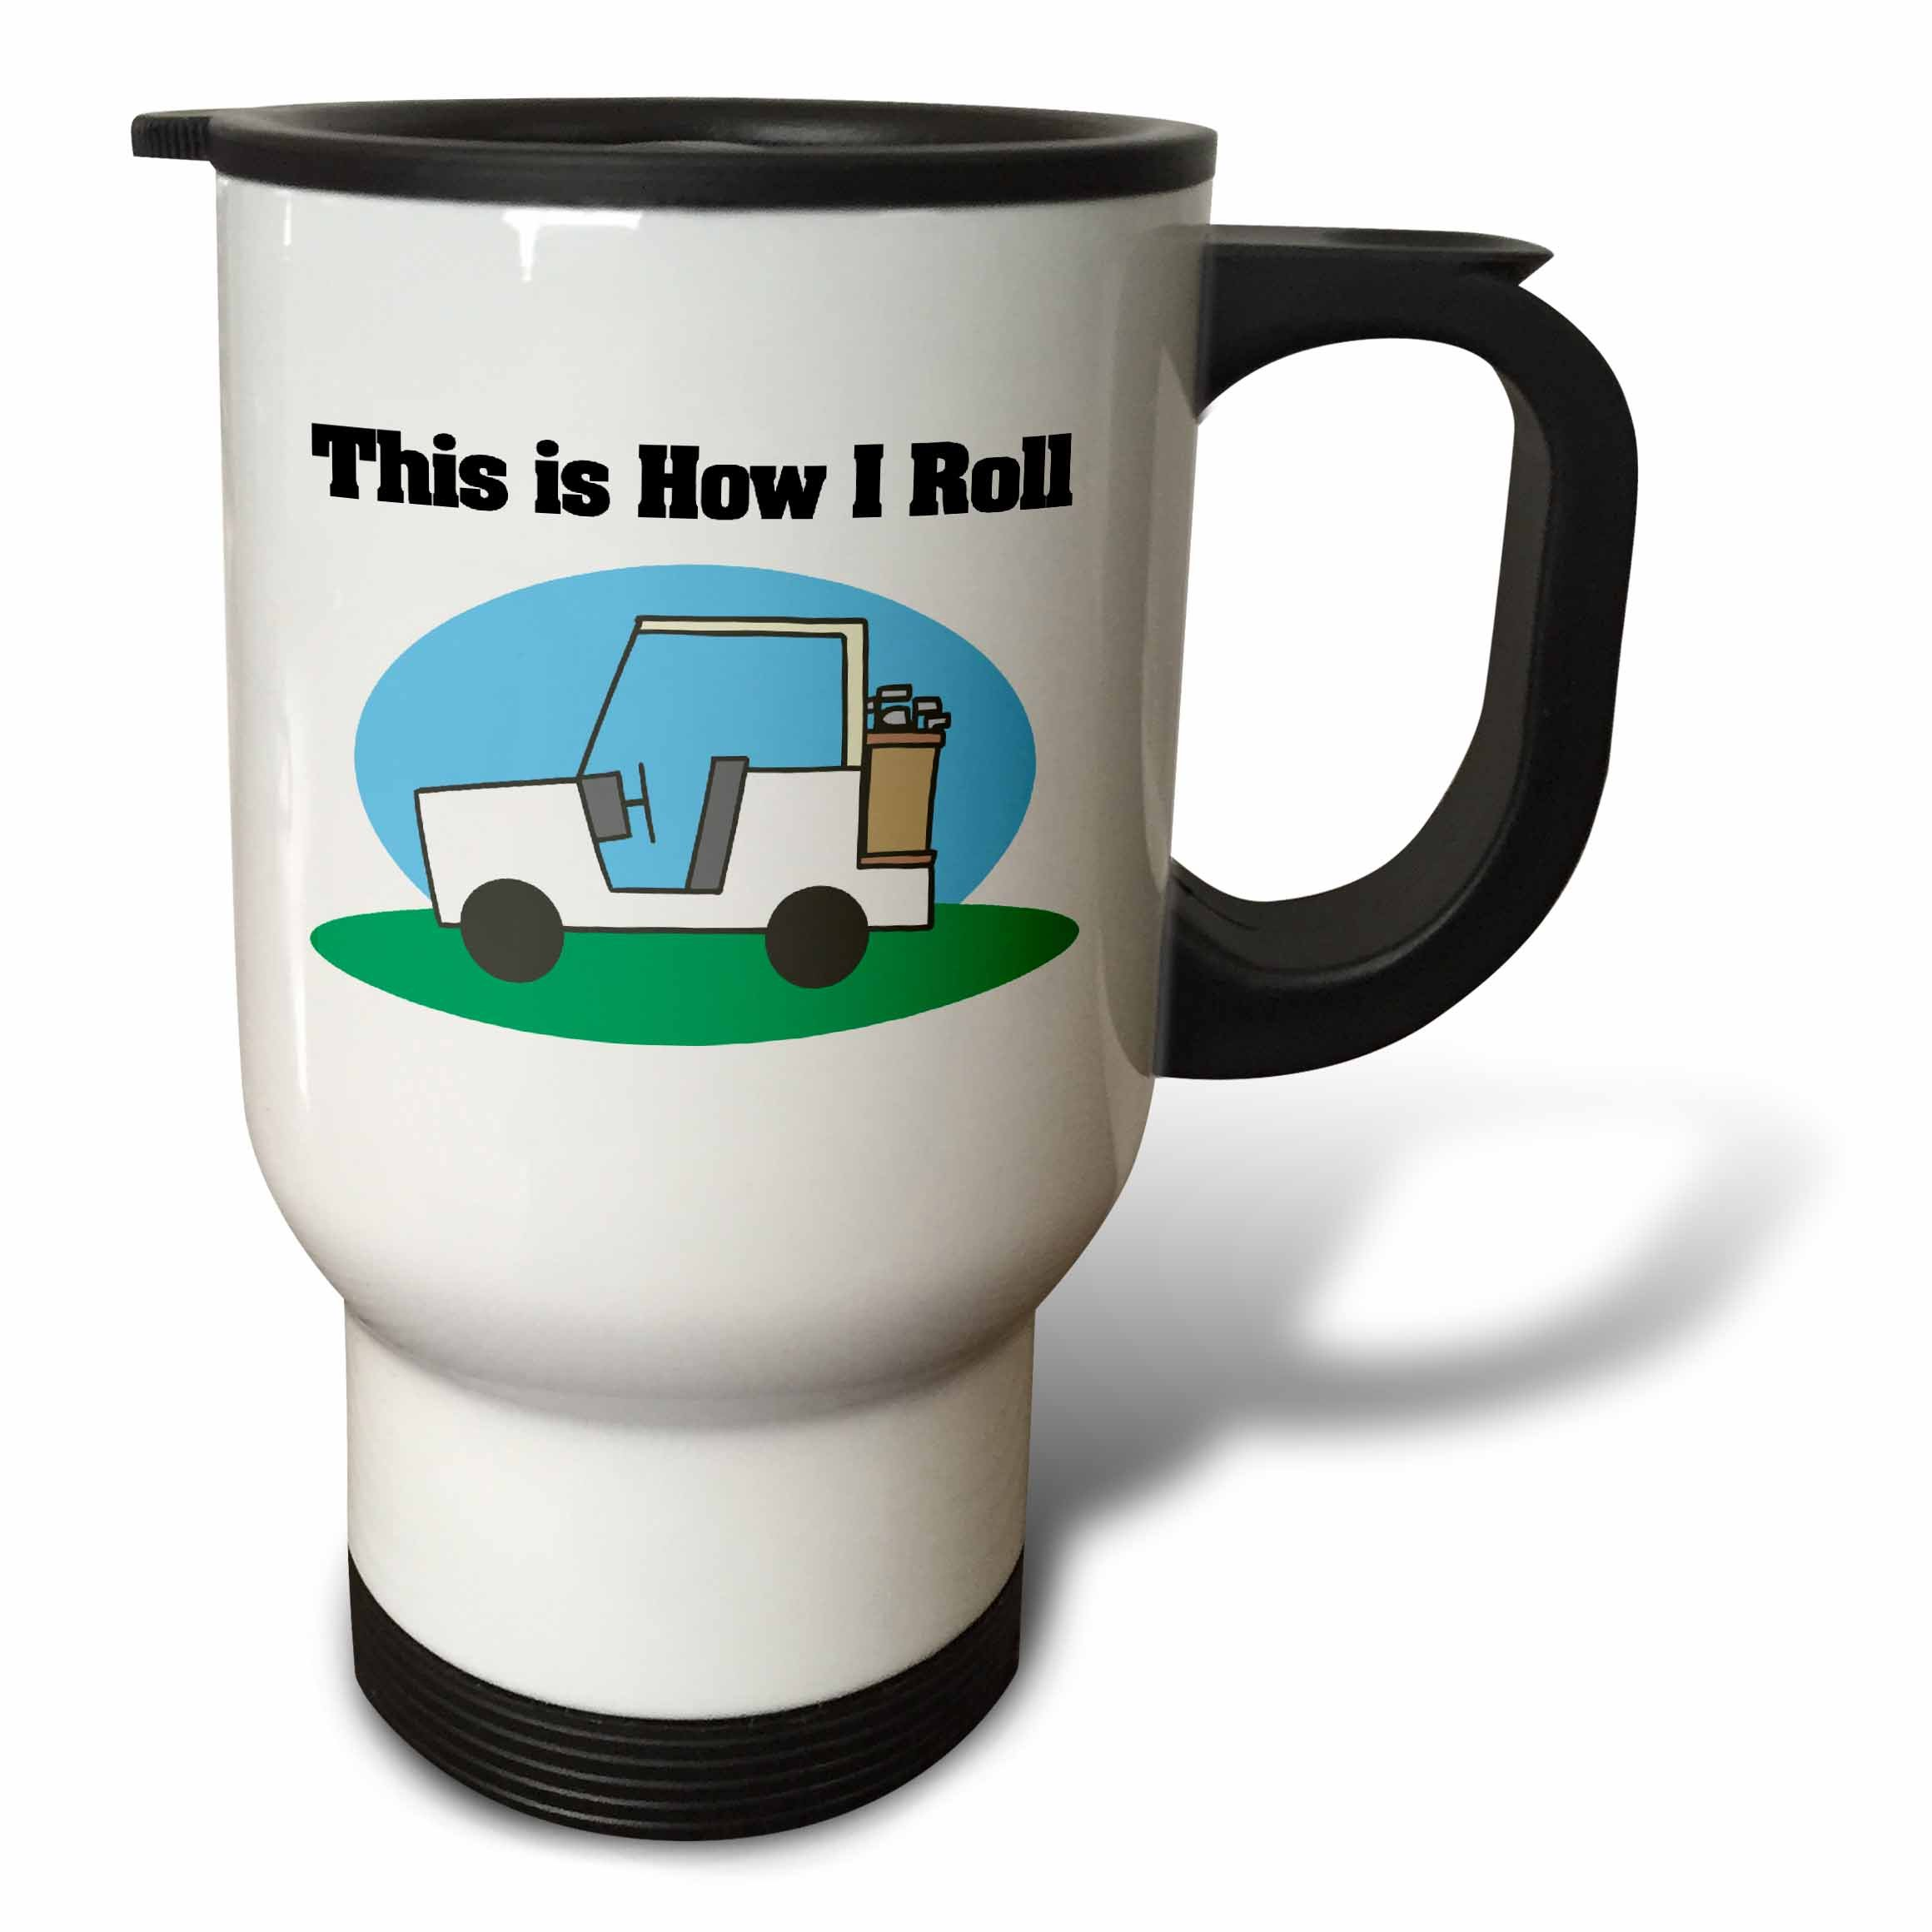 3dRose tm_102572_1'' This is How I Roll Golf Cart Golfing Design Stainless Steel'' Travel Mug, 14 oz, Multicolor